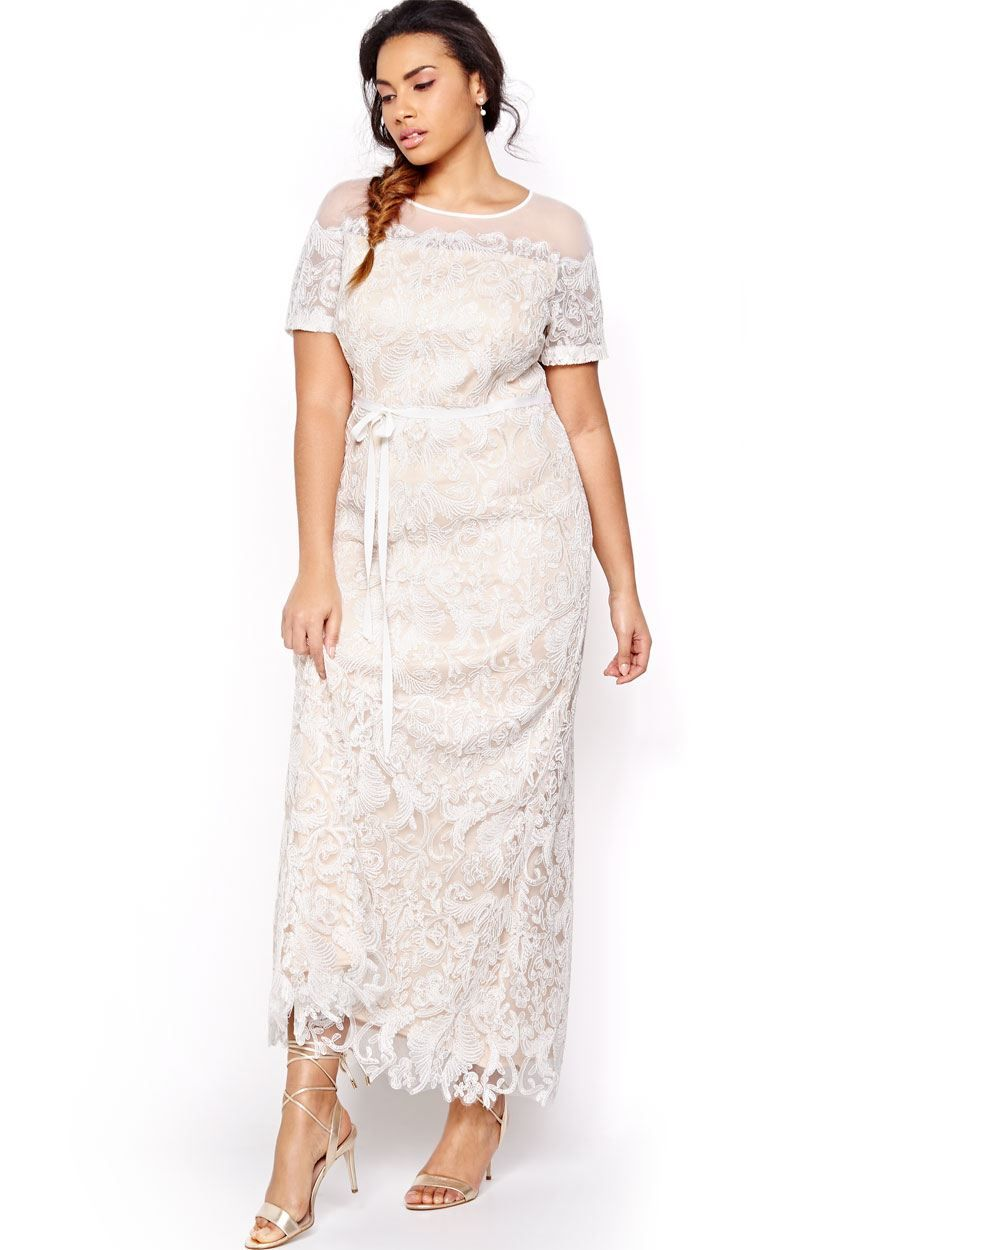 Fresh  Beautiful Custom Made Puffy Mermaid China Express Wedding Gown RQ Alibaba Wedding Dress